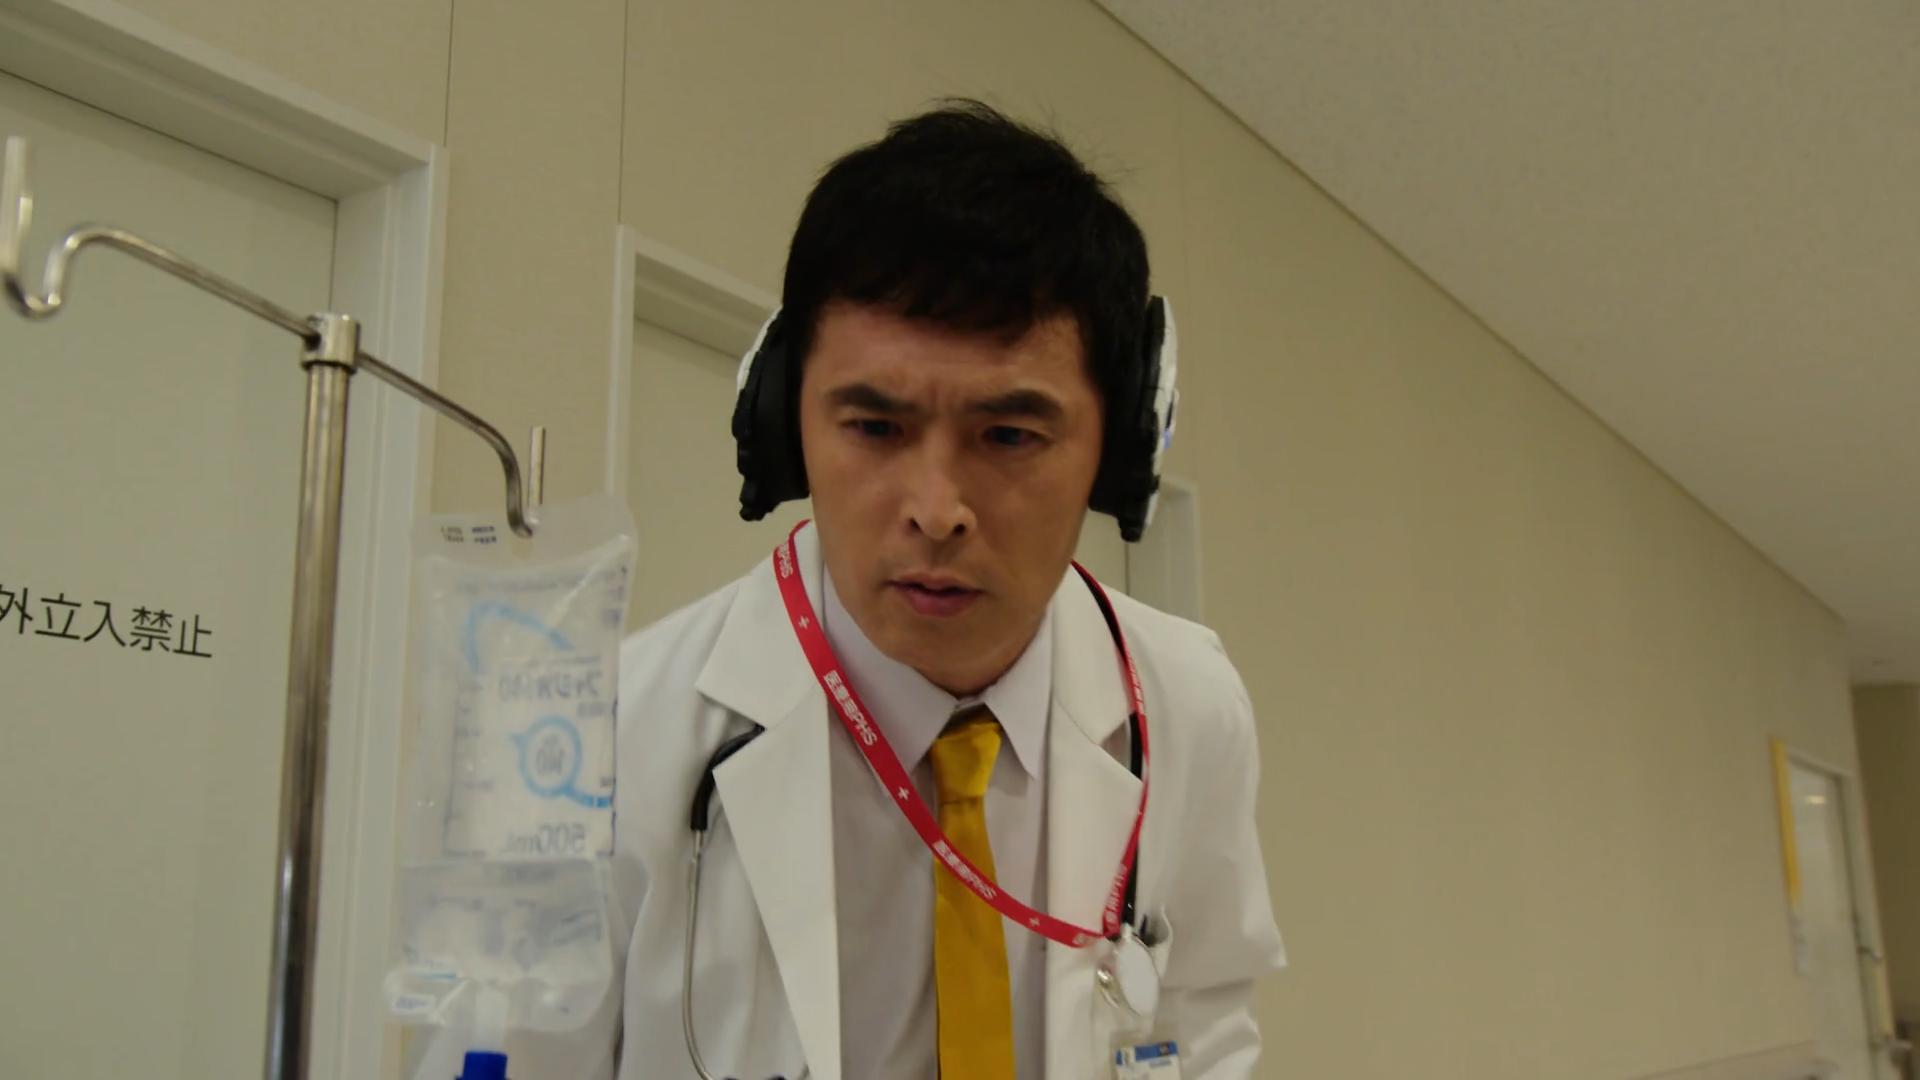 Dr. Omigoto